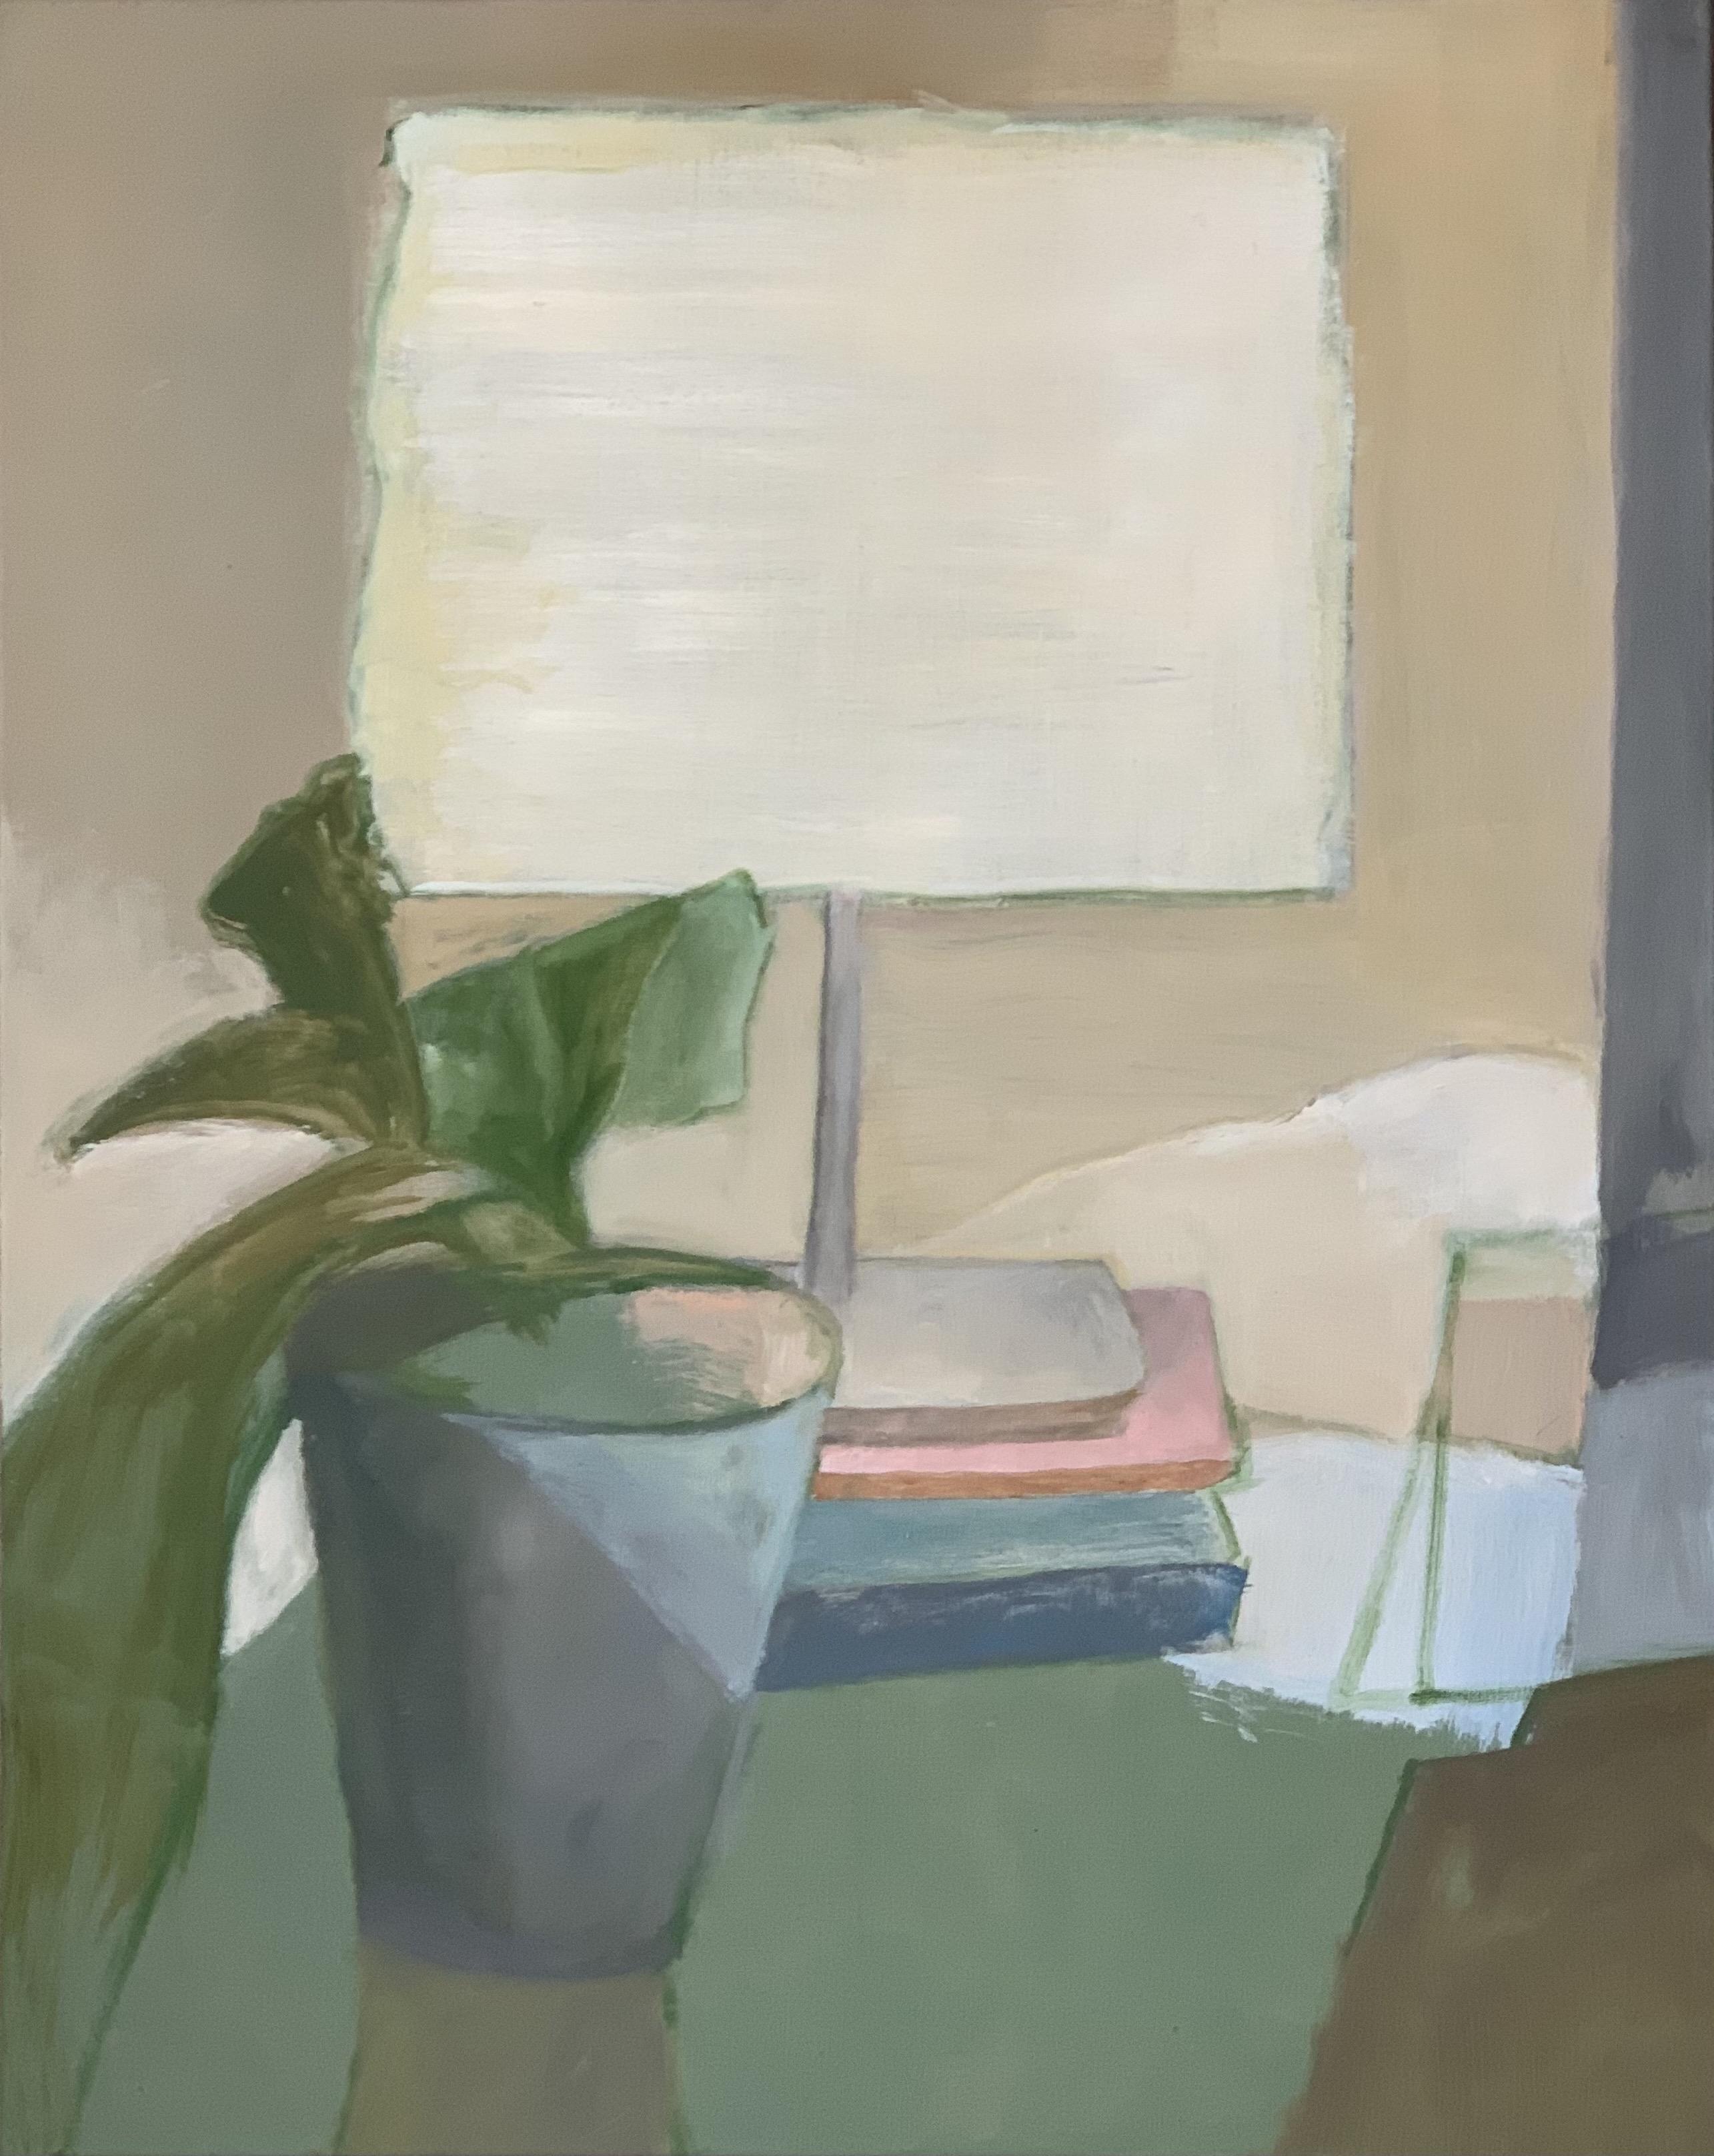 Still Life in the Light artwork by Howard Brotman - art listed for sale on Artplode